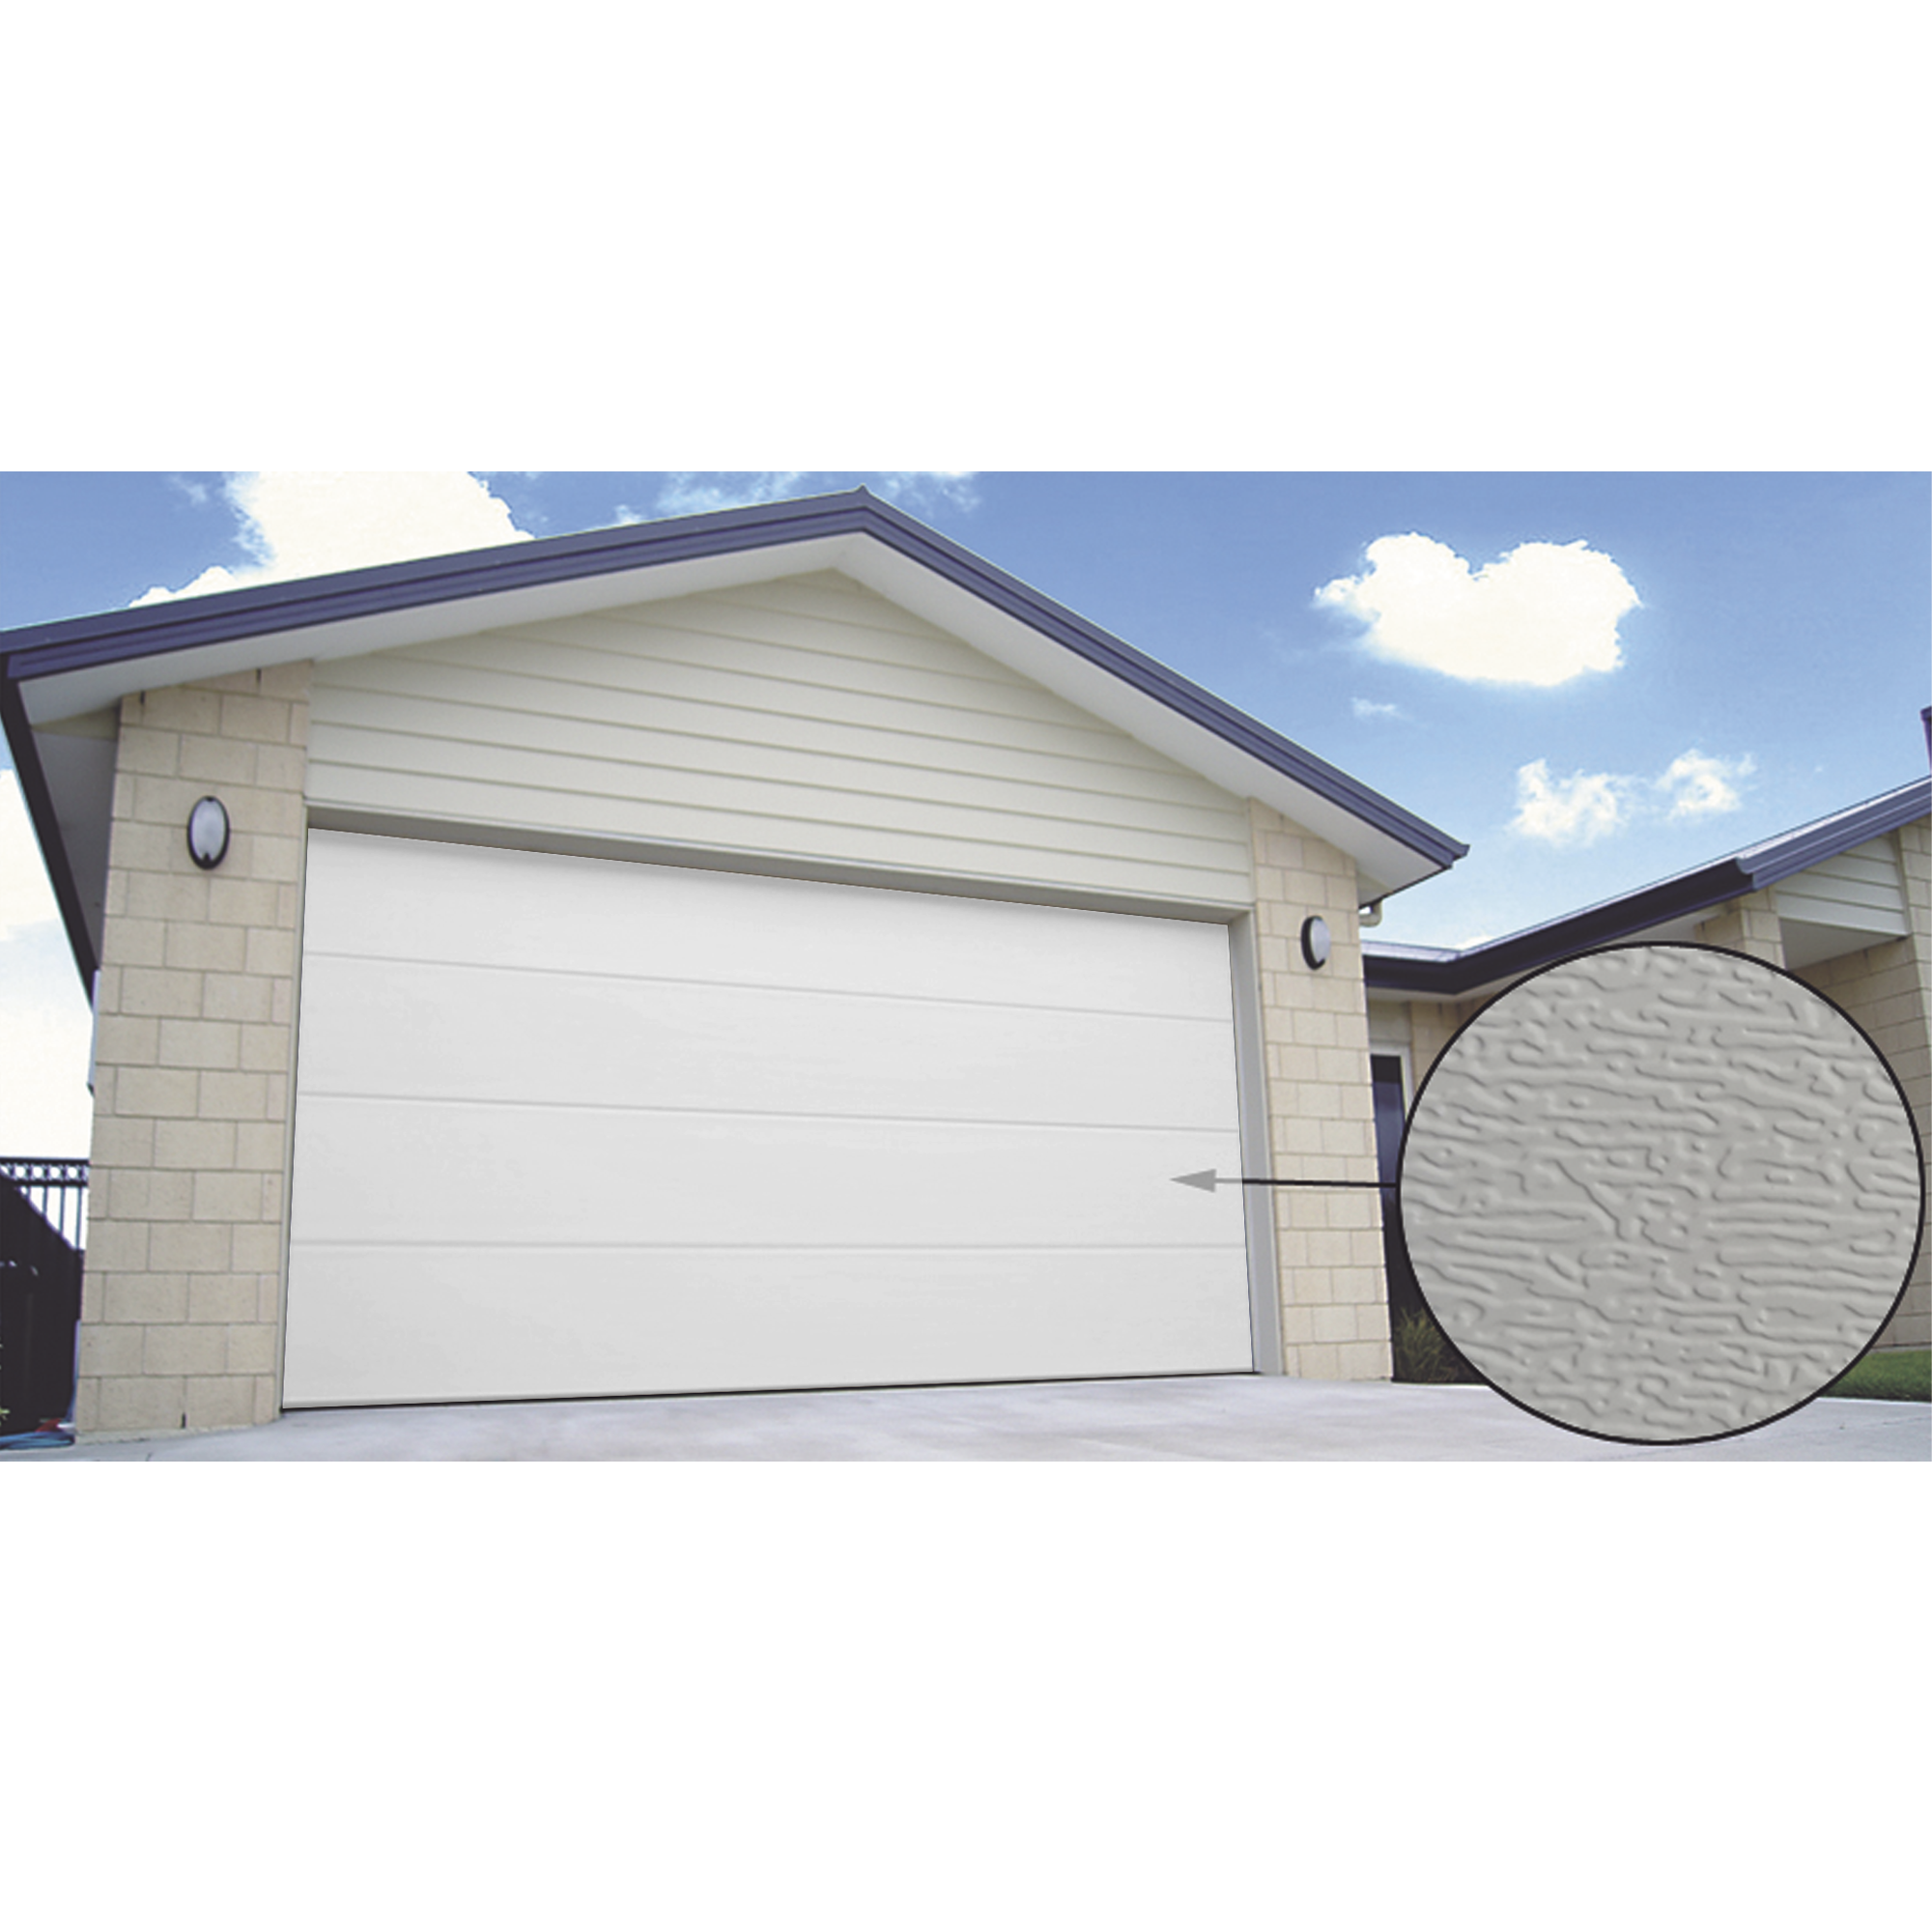 Puerta de Garage PREMIUM, Lisa color blanco  16X8  FT, AISLADA, Estilo U.S.A.